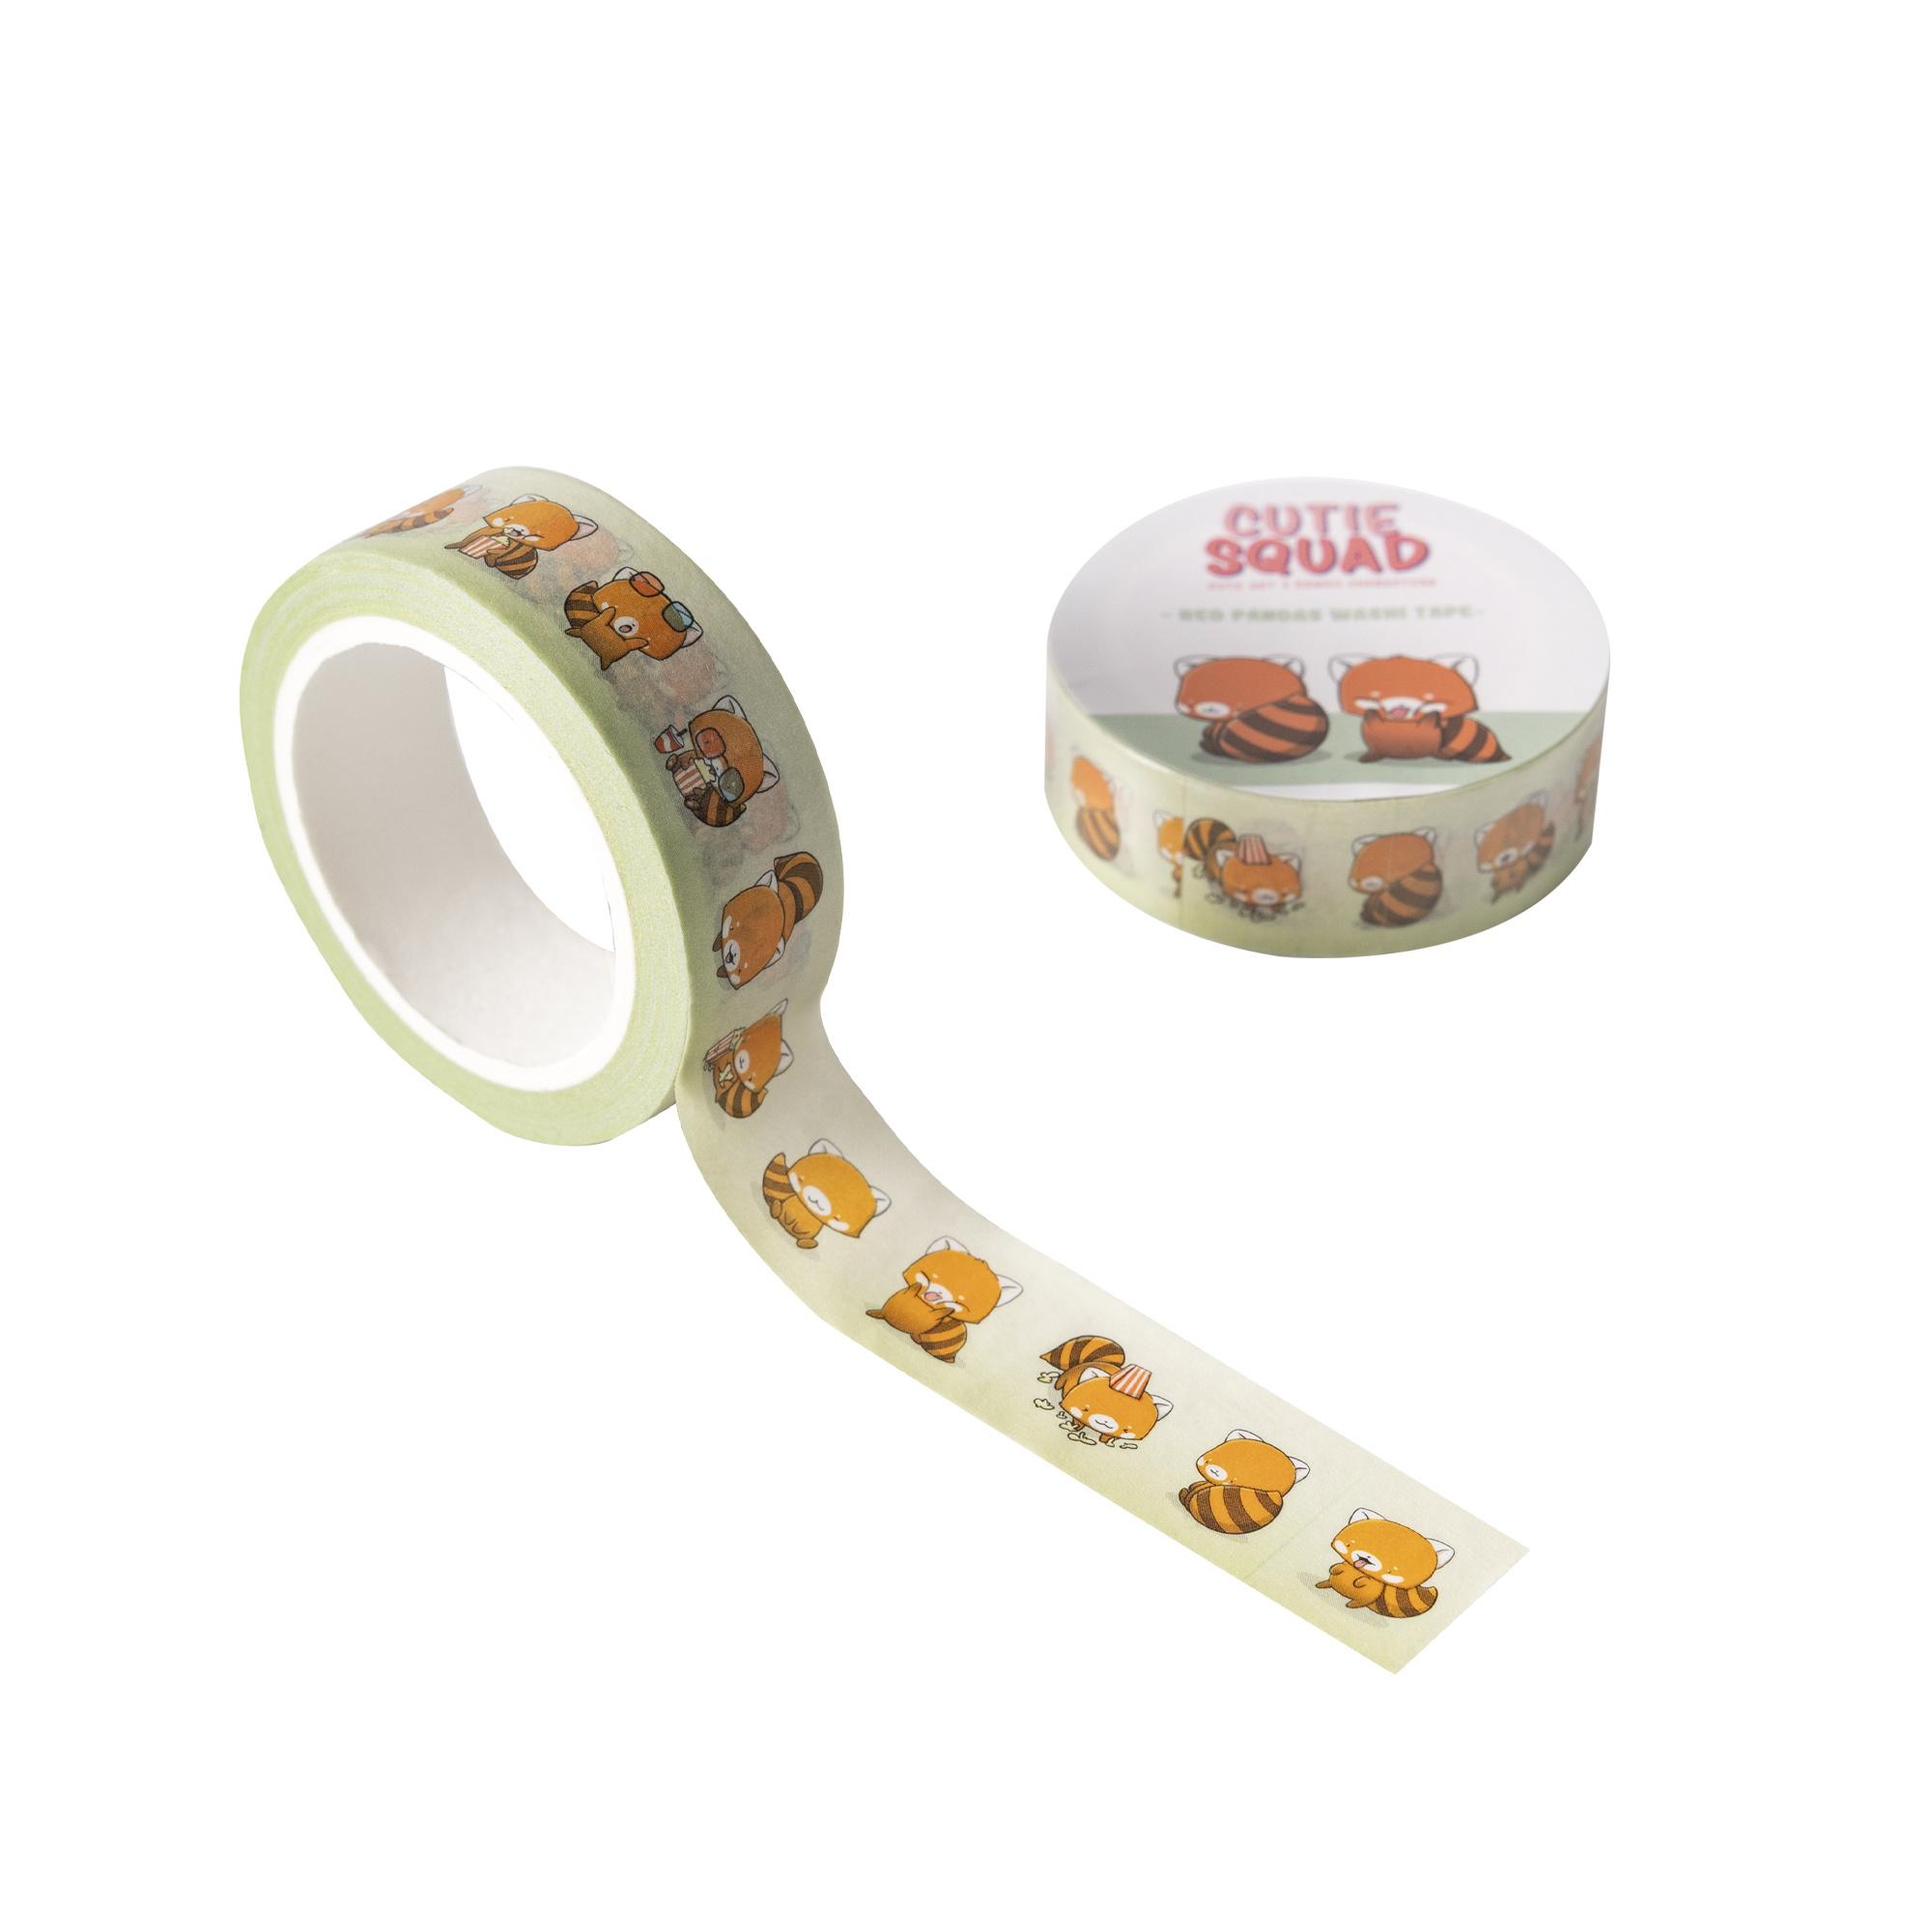 CutieSquad Washi Tape - Red Pandas